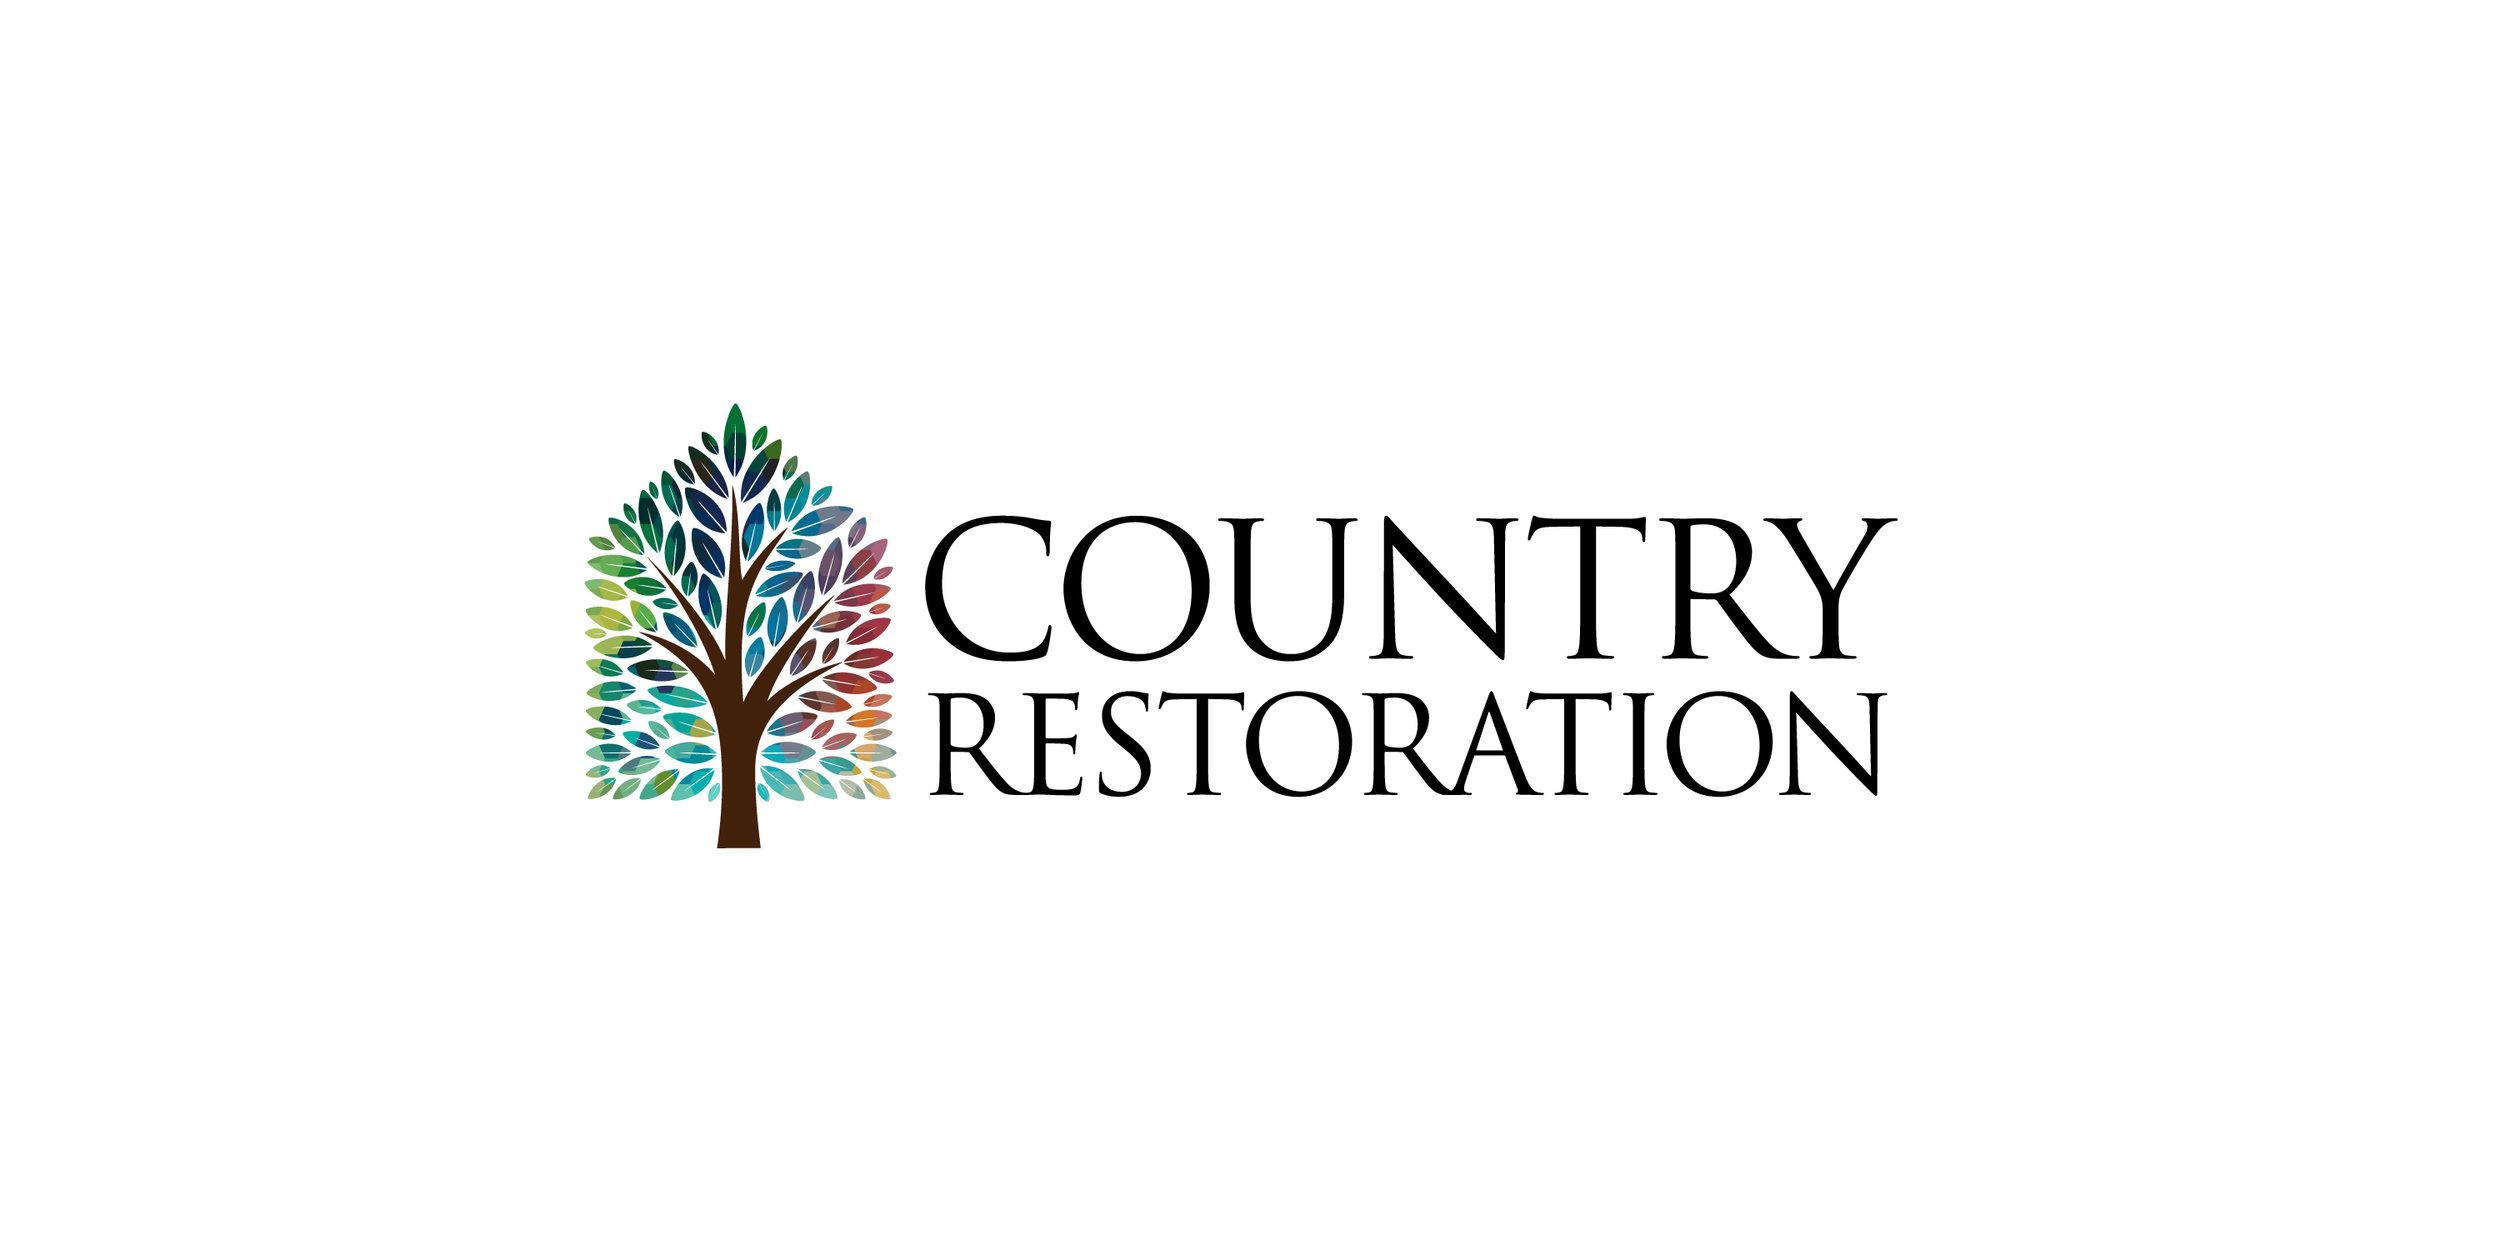 Country_Restoration_2.jpg